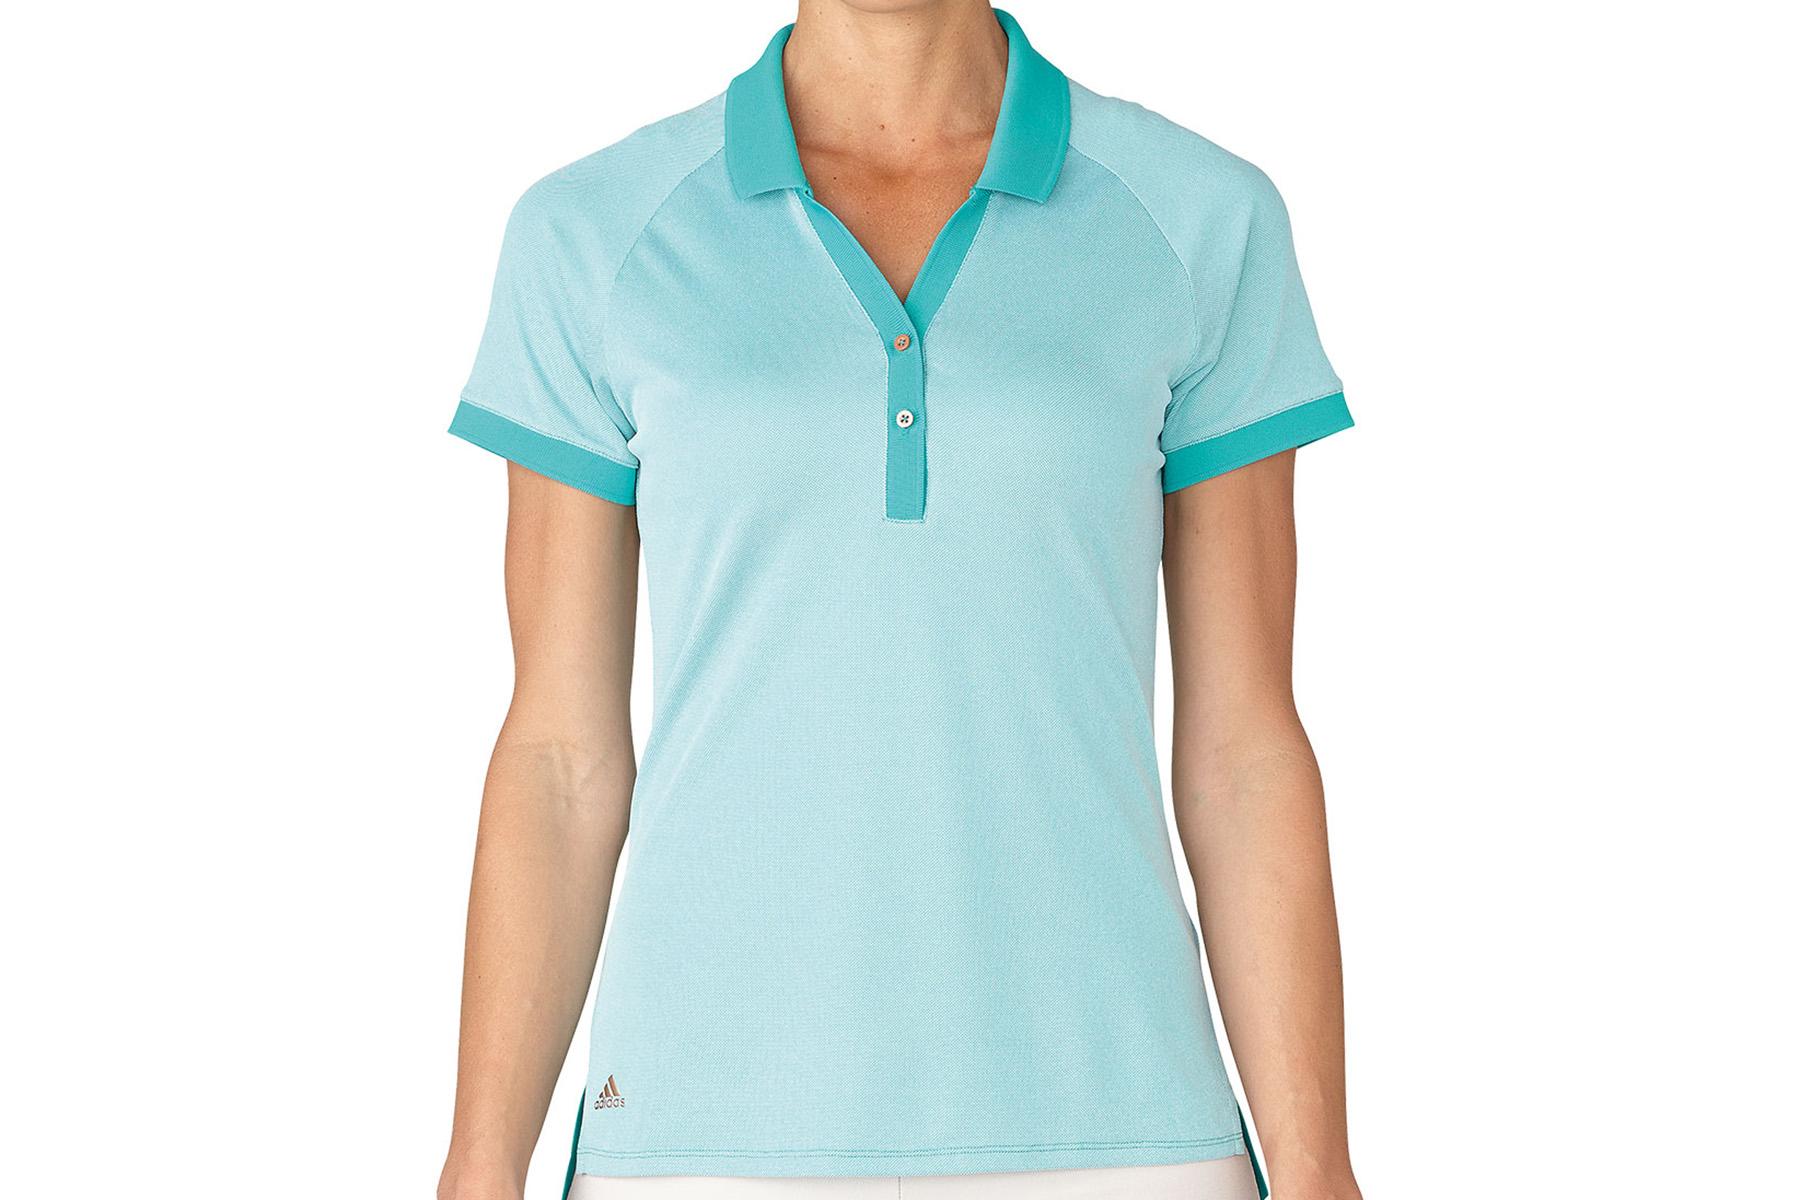 polo adidas golf essentials pique pour femmes online golf. Black Bedroom Furniture Sets. Home Design Ideas